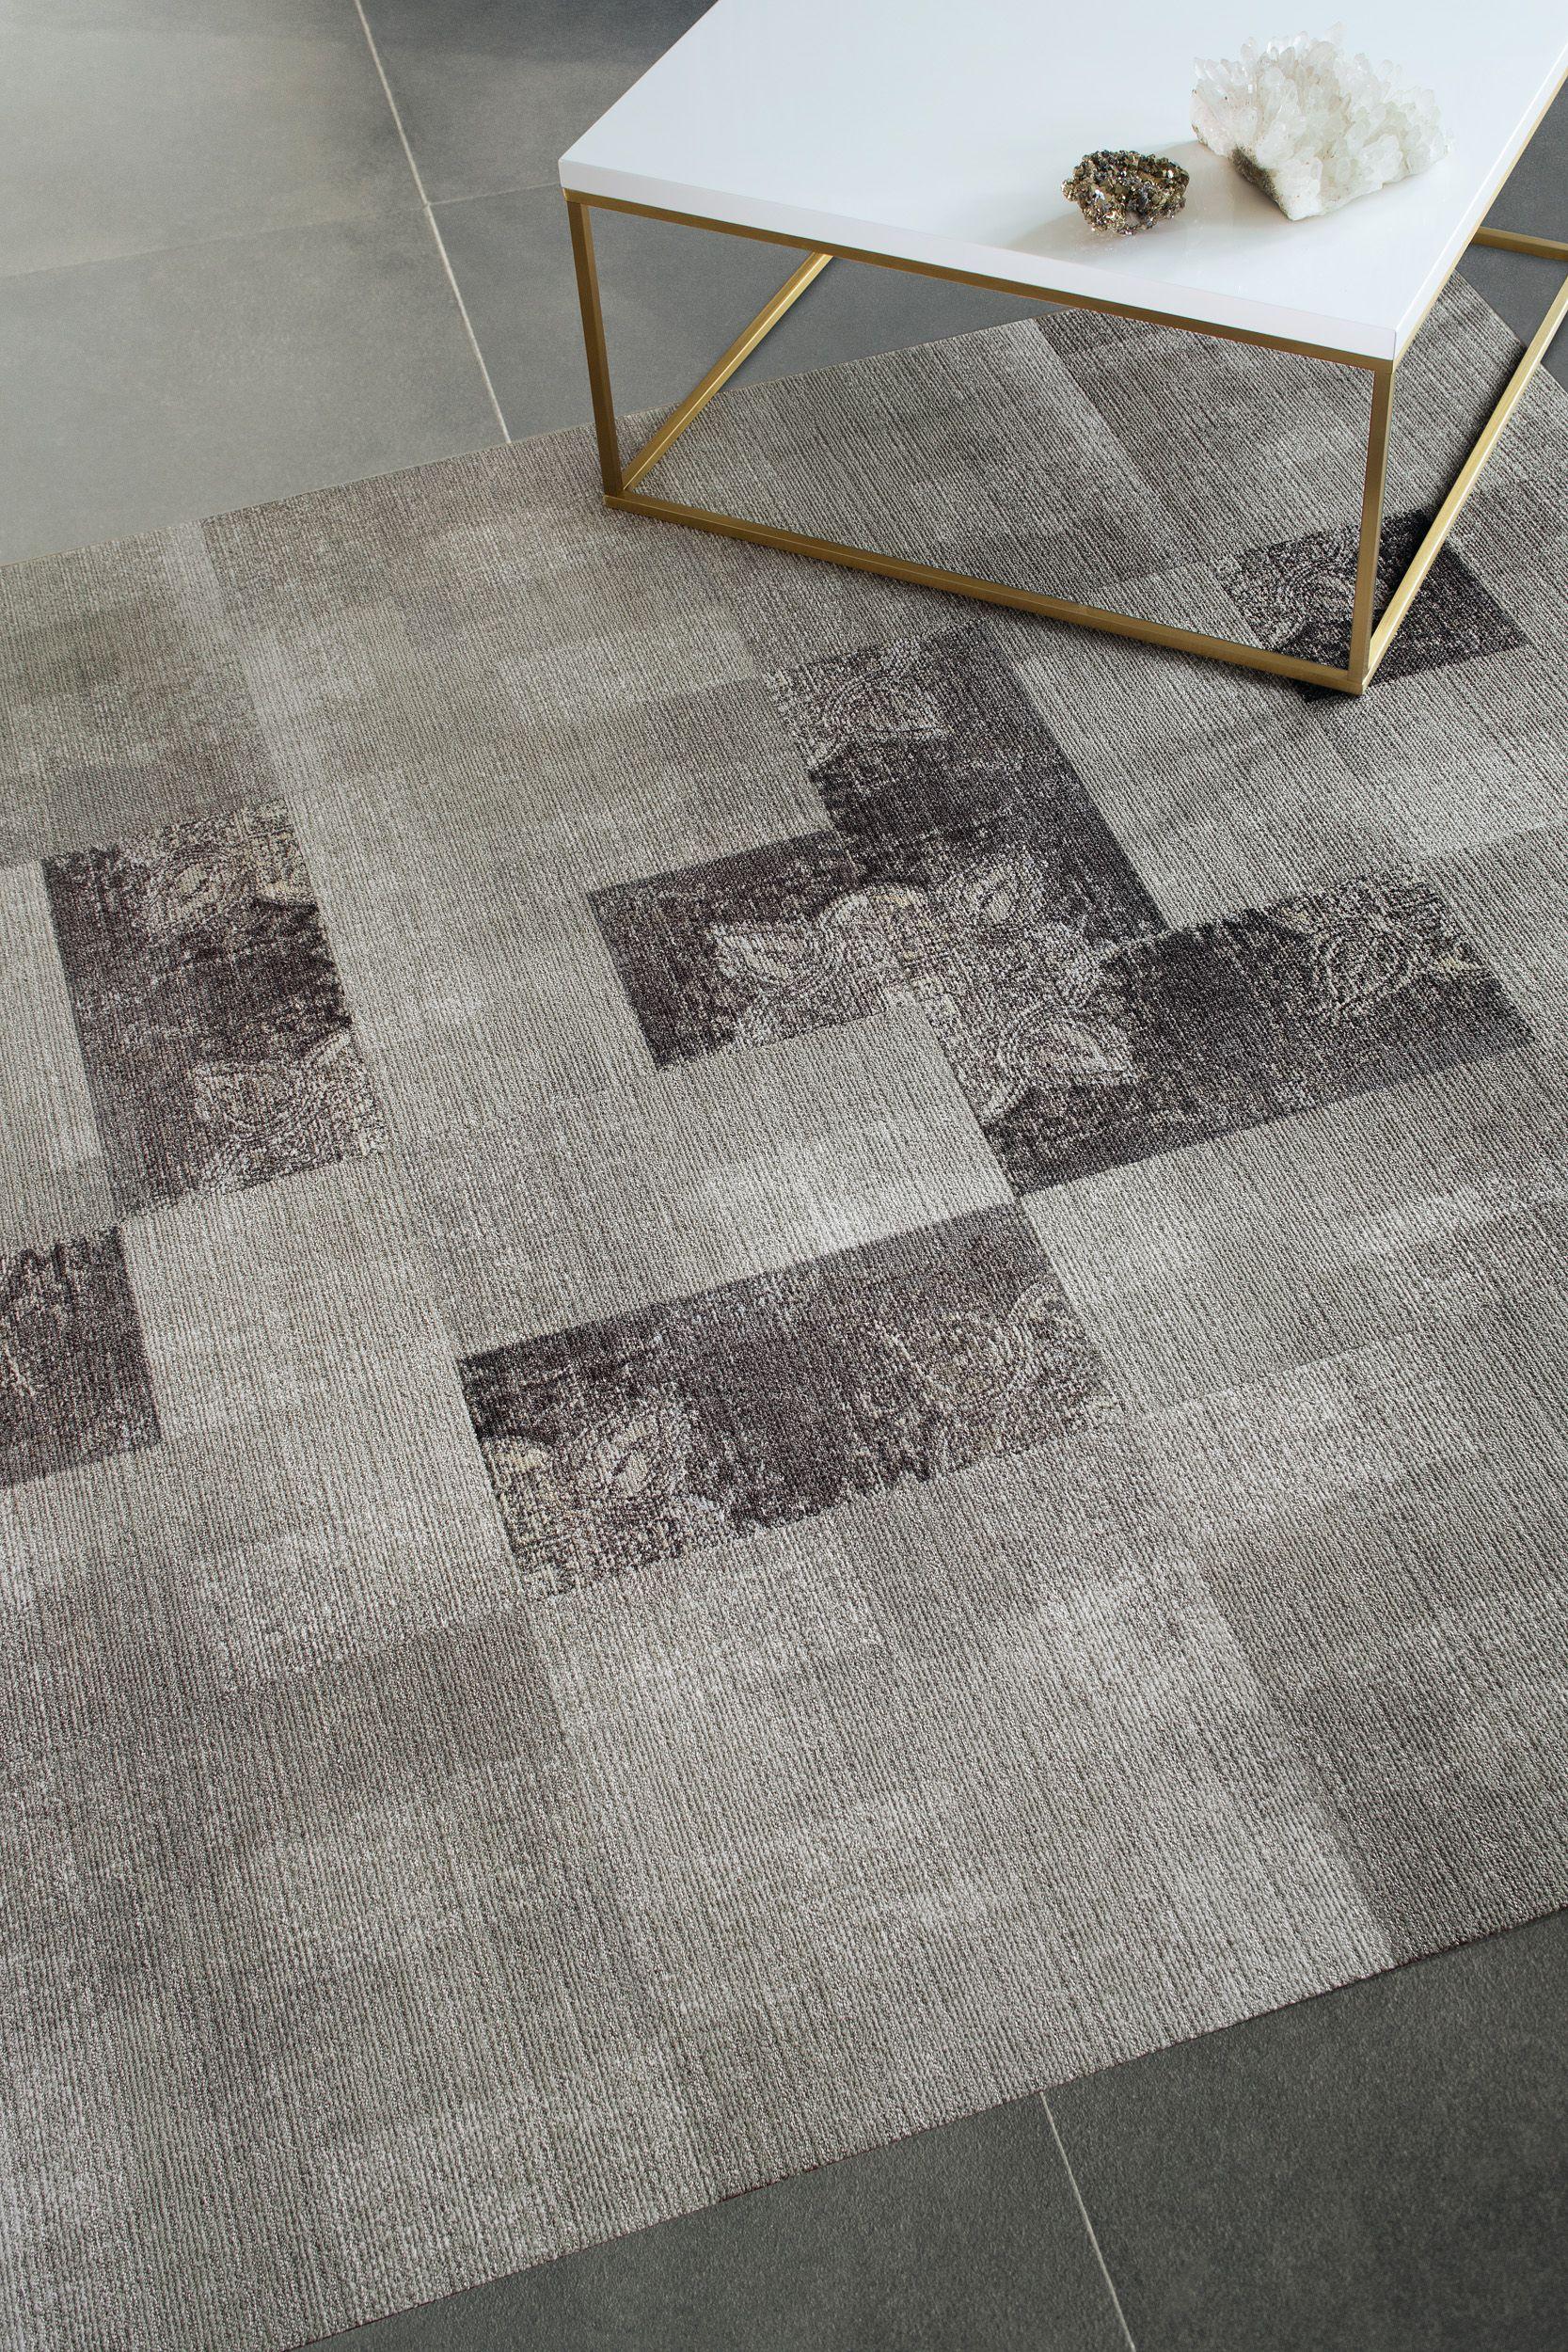 Milliken Carpet Design Historic Clashes Inset Timeless Delcate